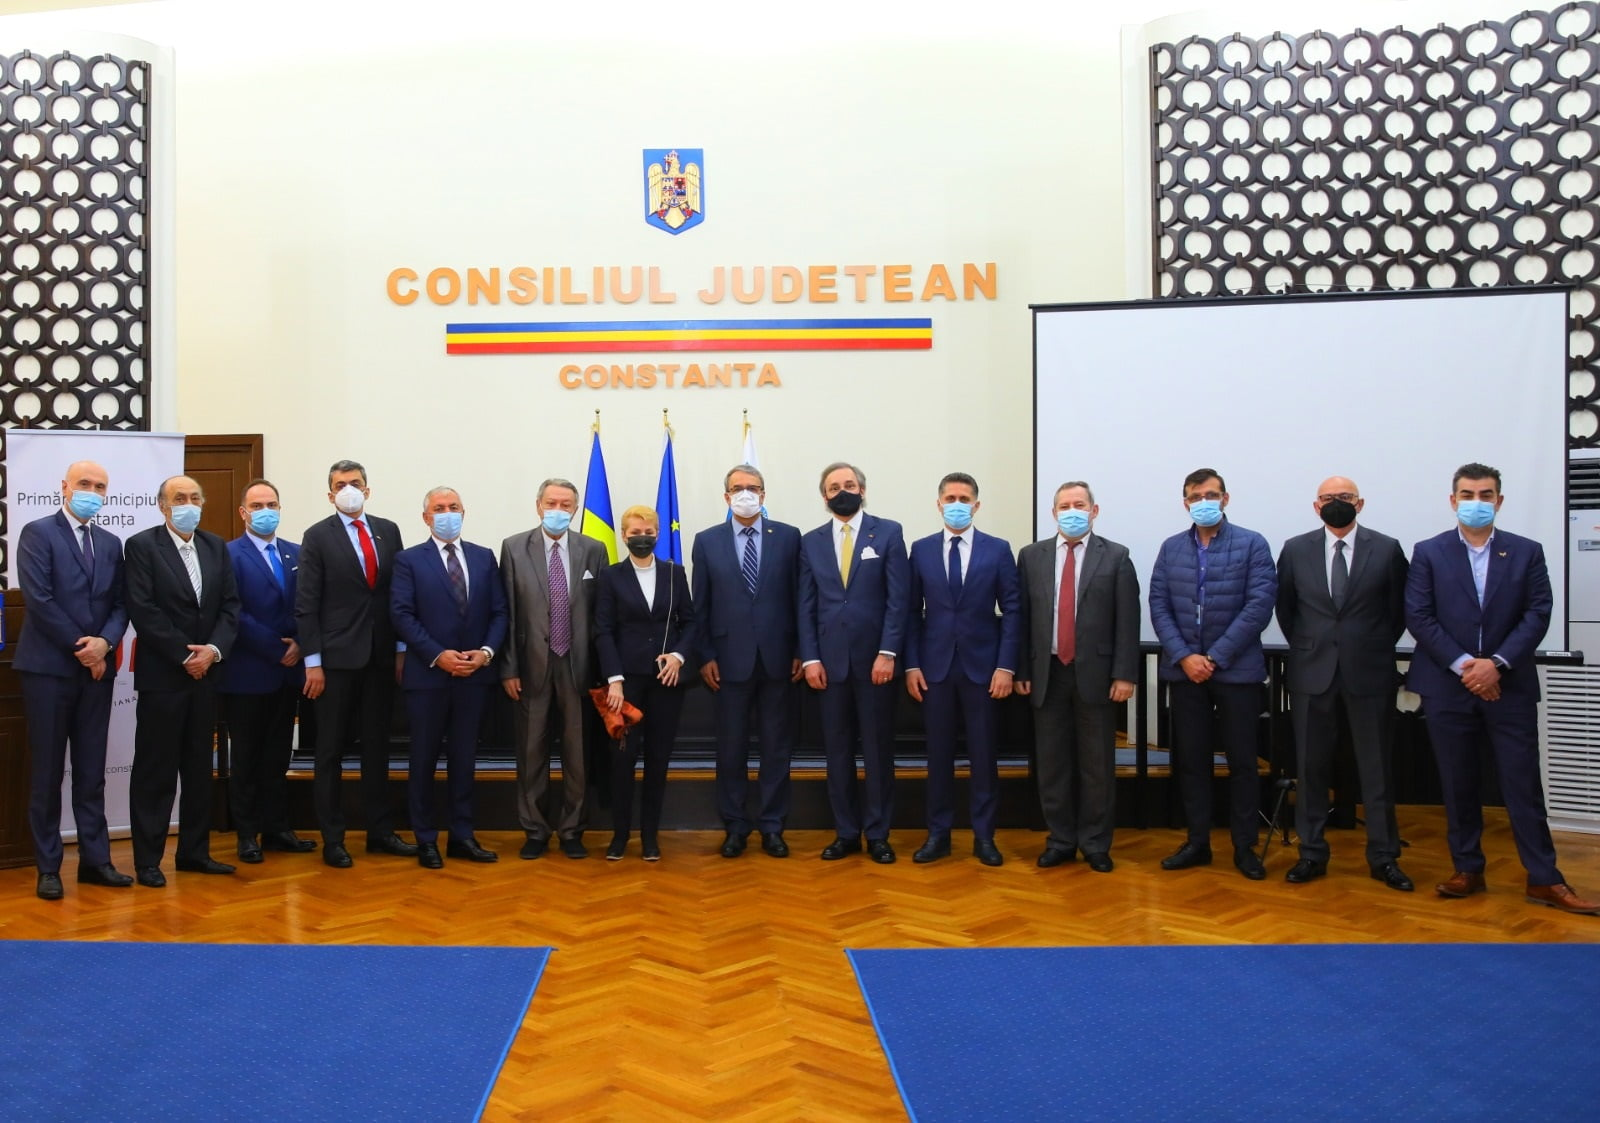 consiliul diplomatic 2